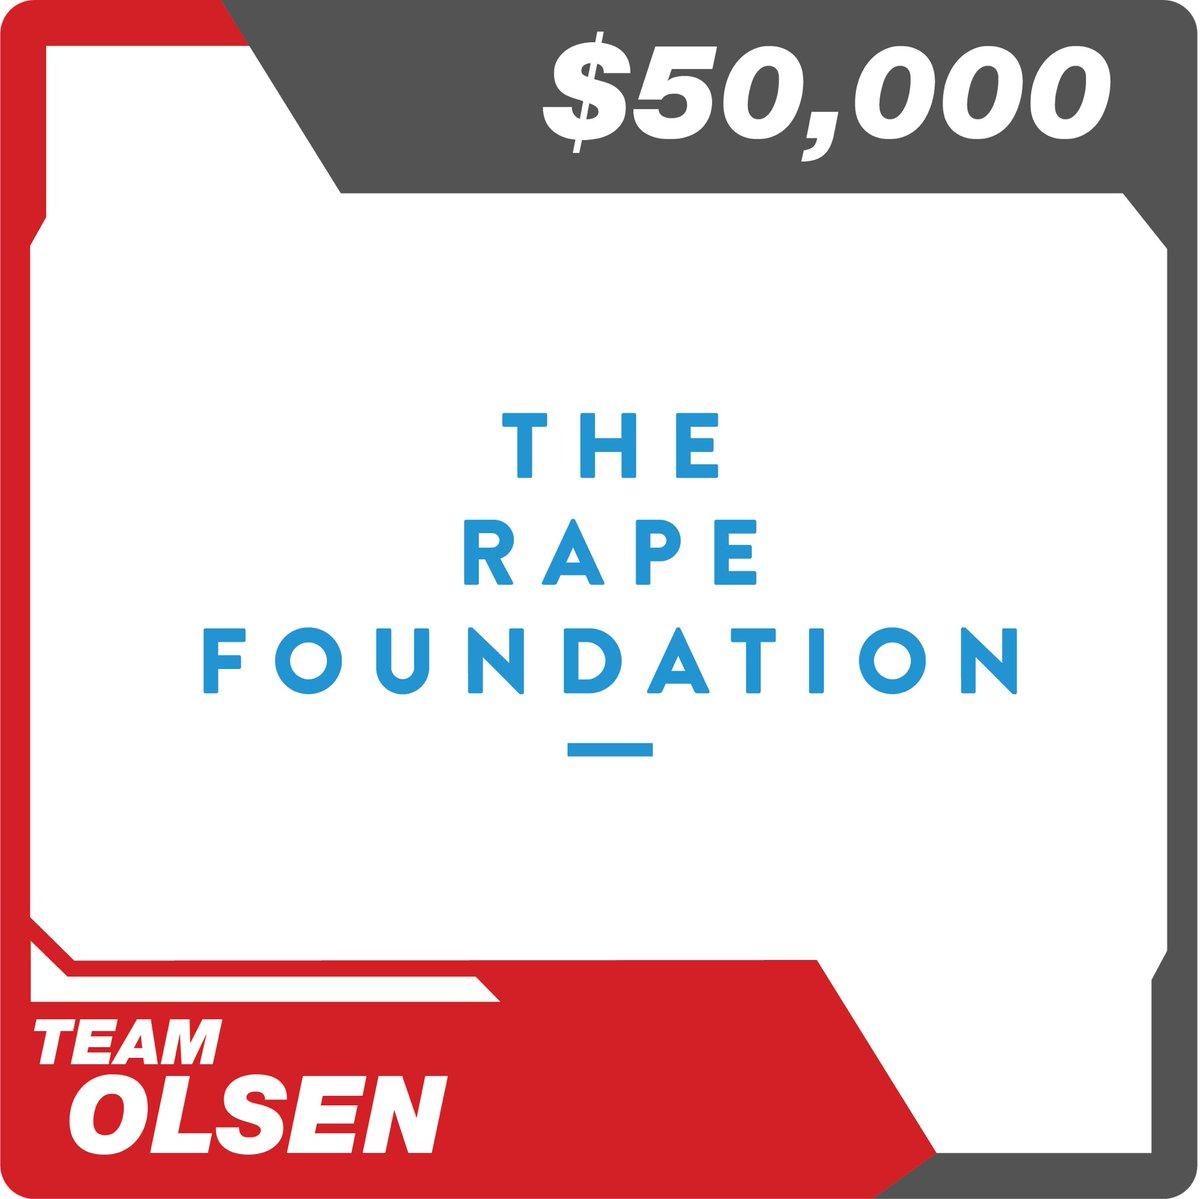 #TeamOlsen #ElizabethOlsen #TheRapeFoundation